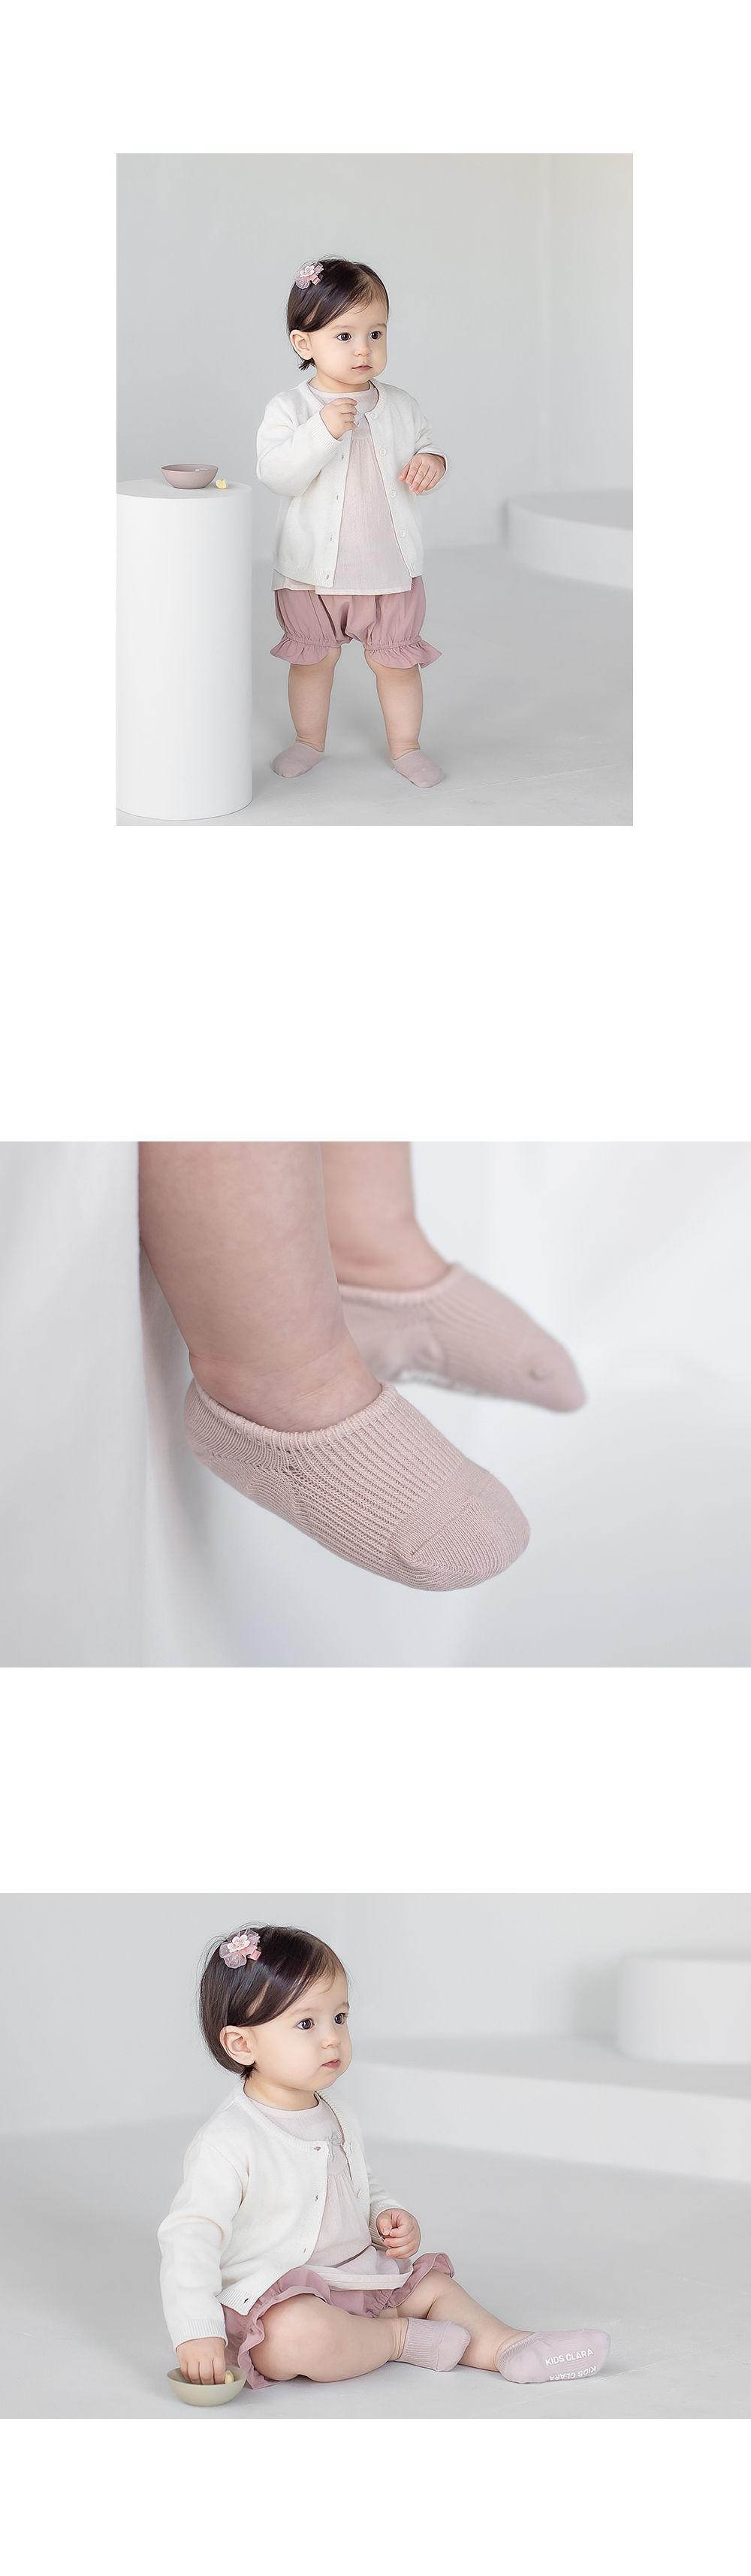 KIDS CLARA - Korean Children Fashion - #Kfashion4kids - Nest Baby Boat Socks 2-in-1 [set of 5] - 9